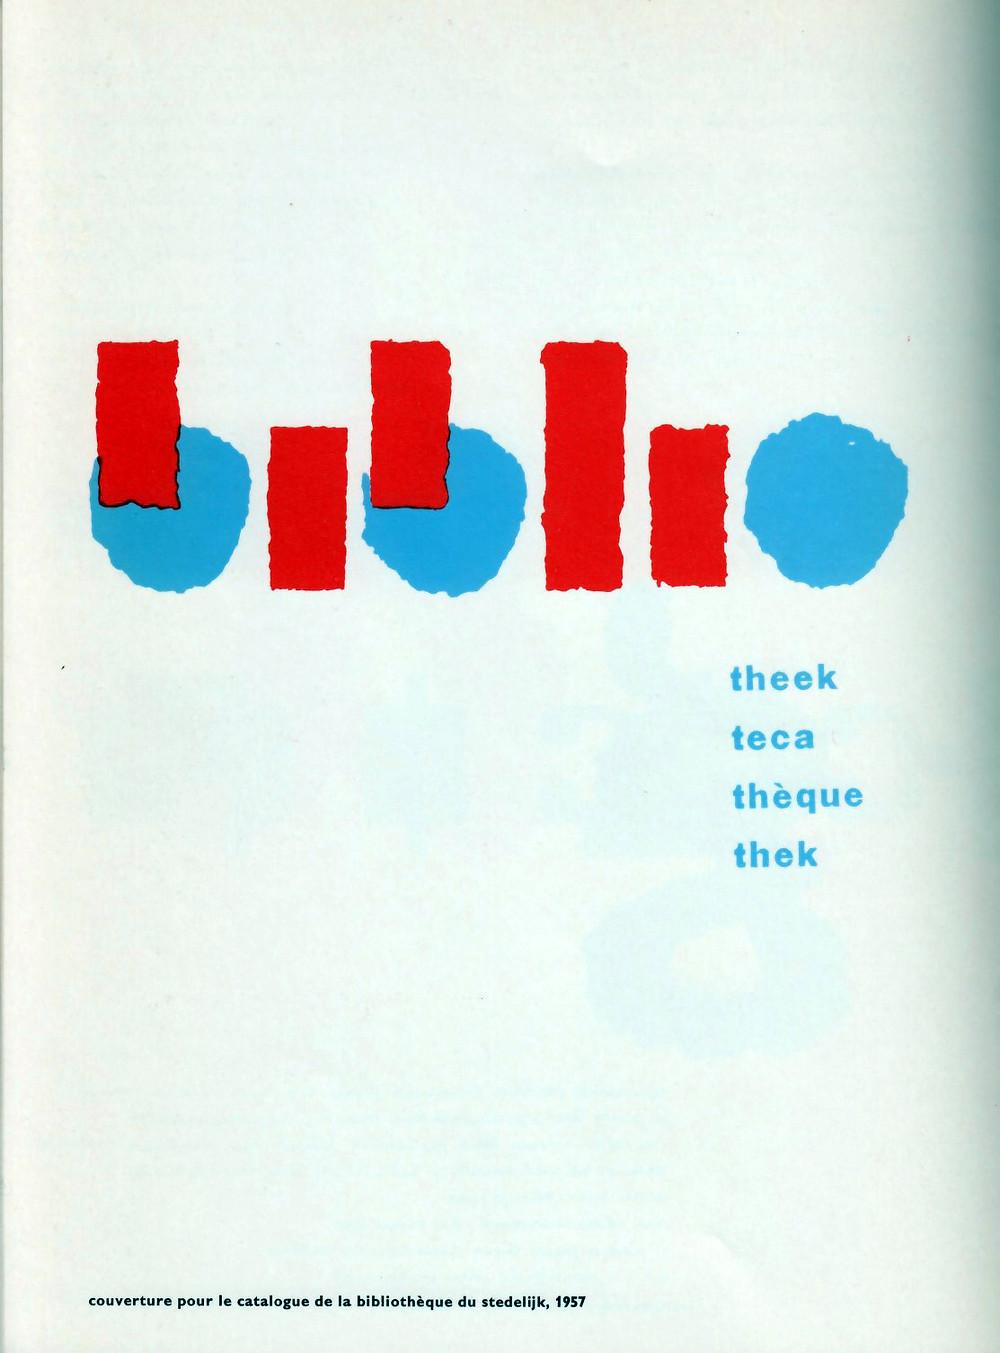 Cover for the catalogue de la Biblioteque due Stedelijk, 1957.